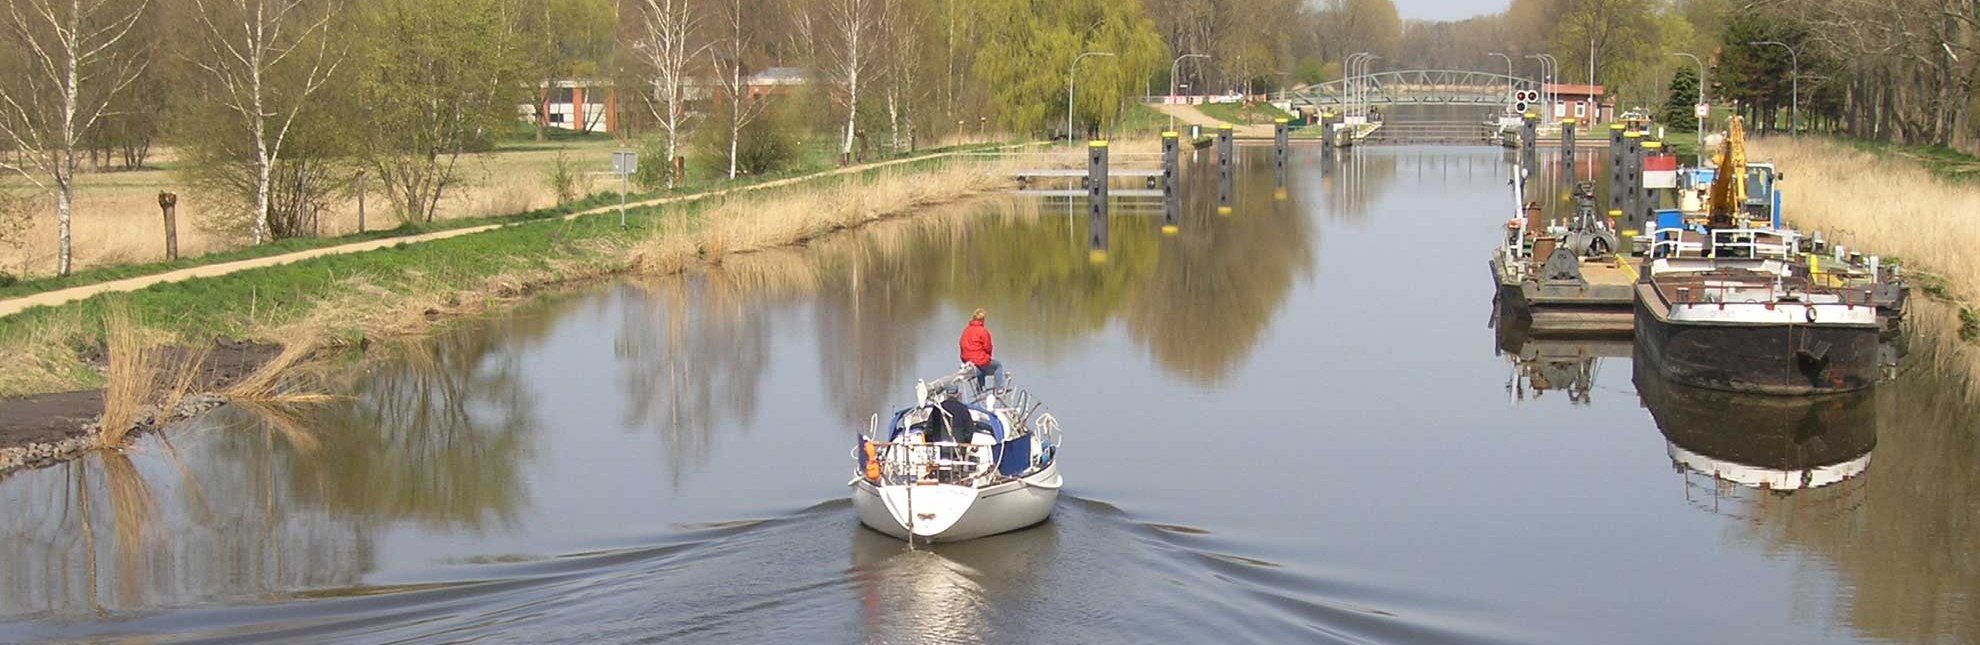 Elbe-Lübeck-Kanal bei Berkenthin, © HLMS